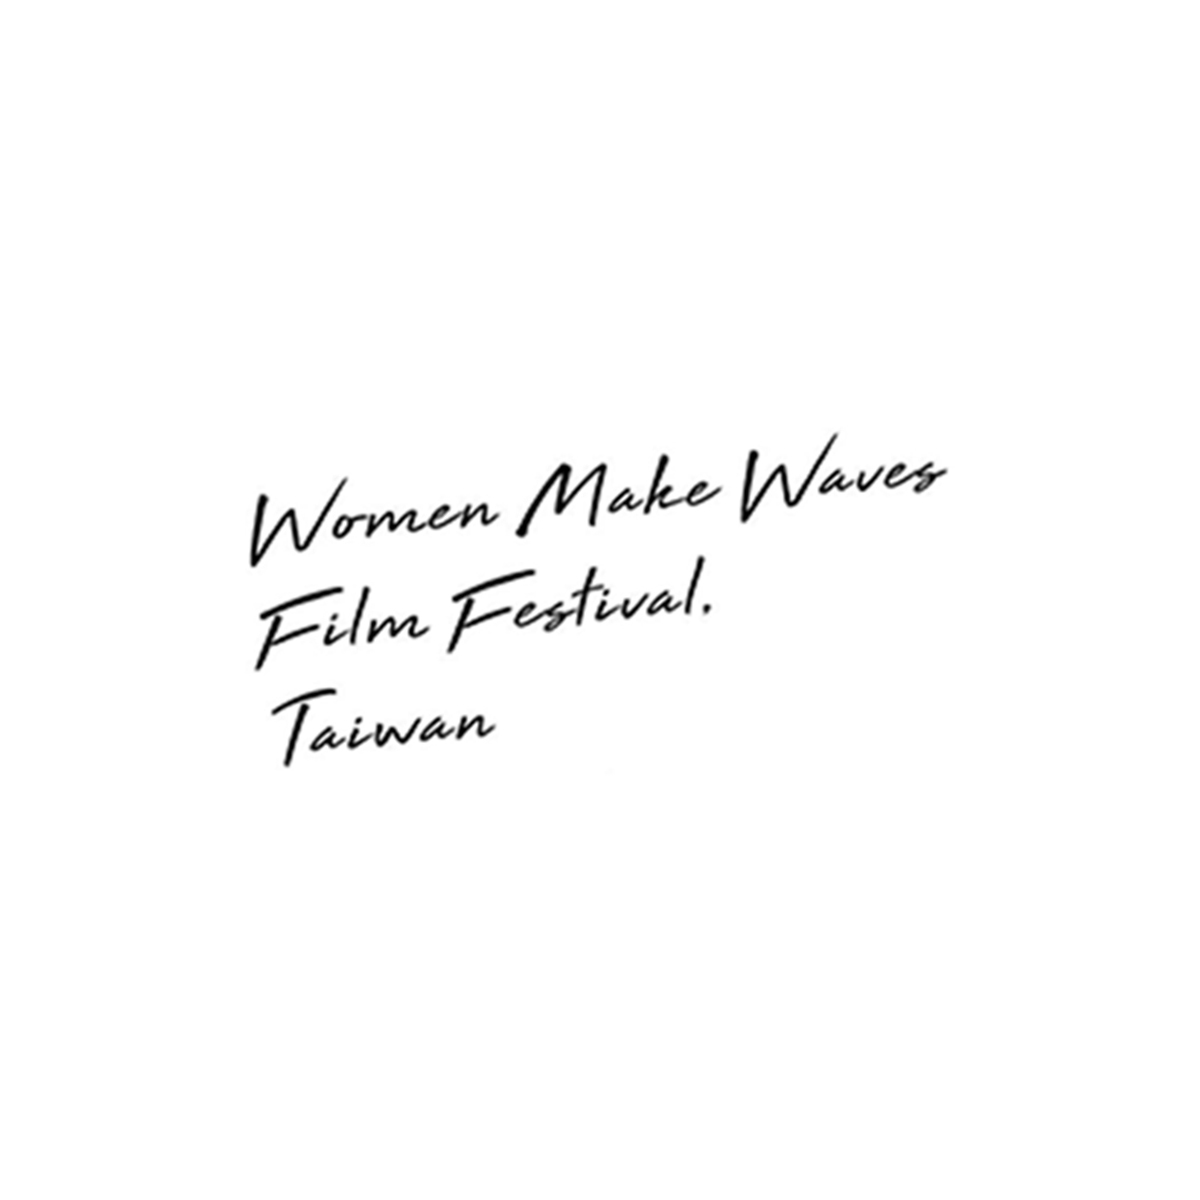 Women Make Waves Film Festival Taiwan 台灣國際女性影展